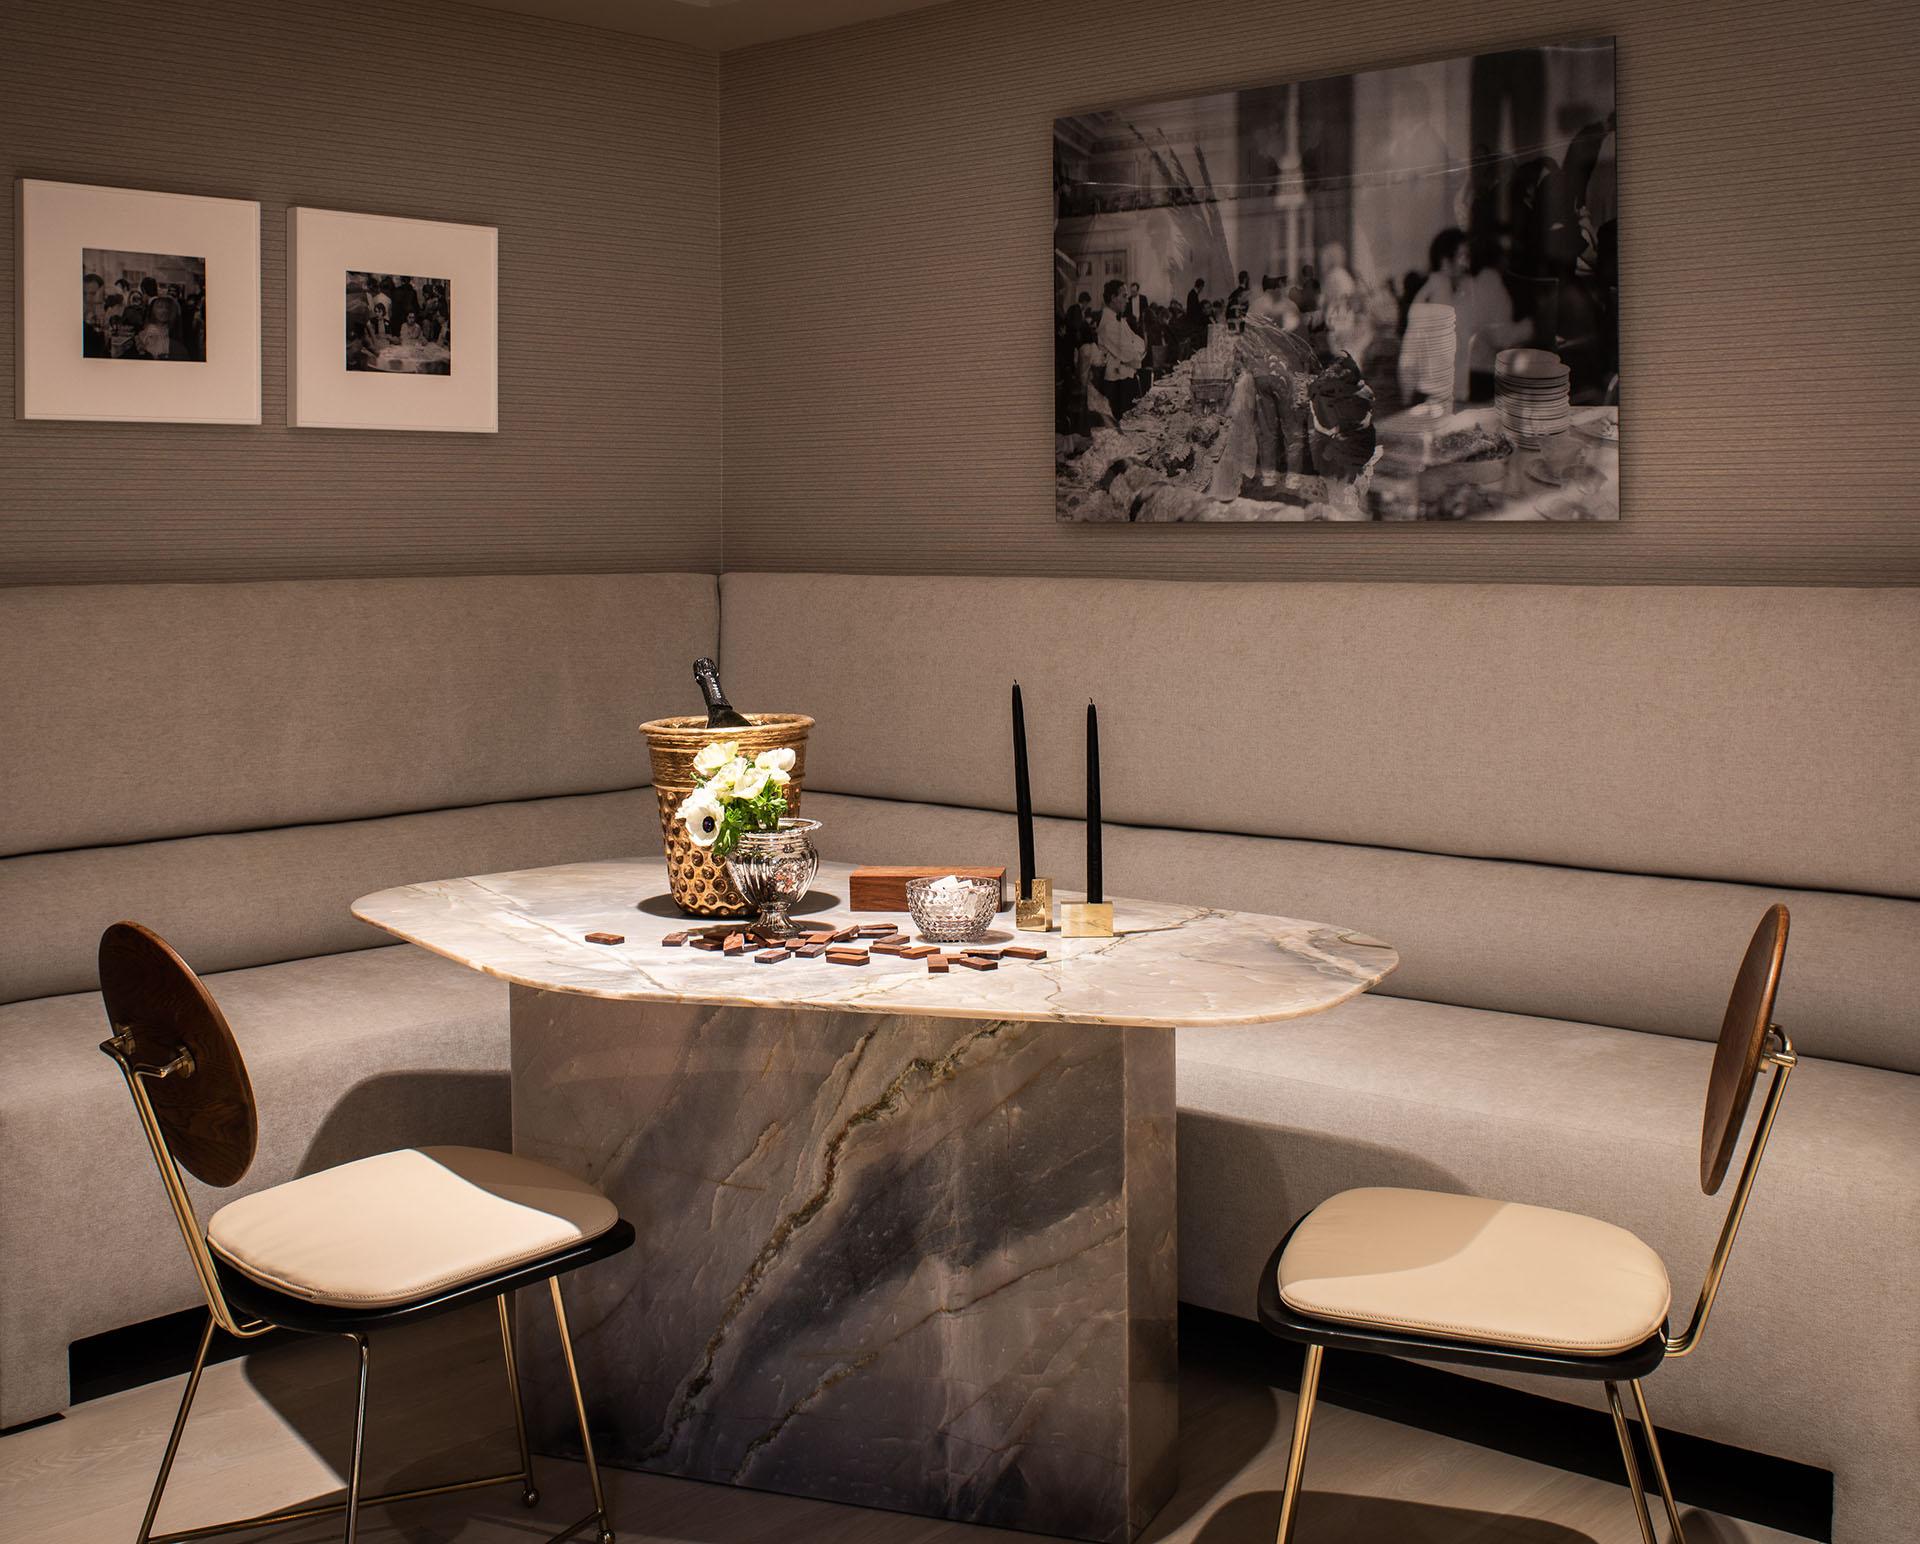 BelewArmour_Lounge3_Room#38_SFShowcase19_LowRes.jpg